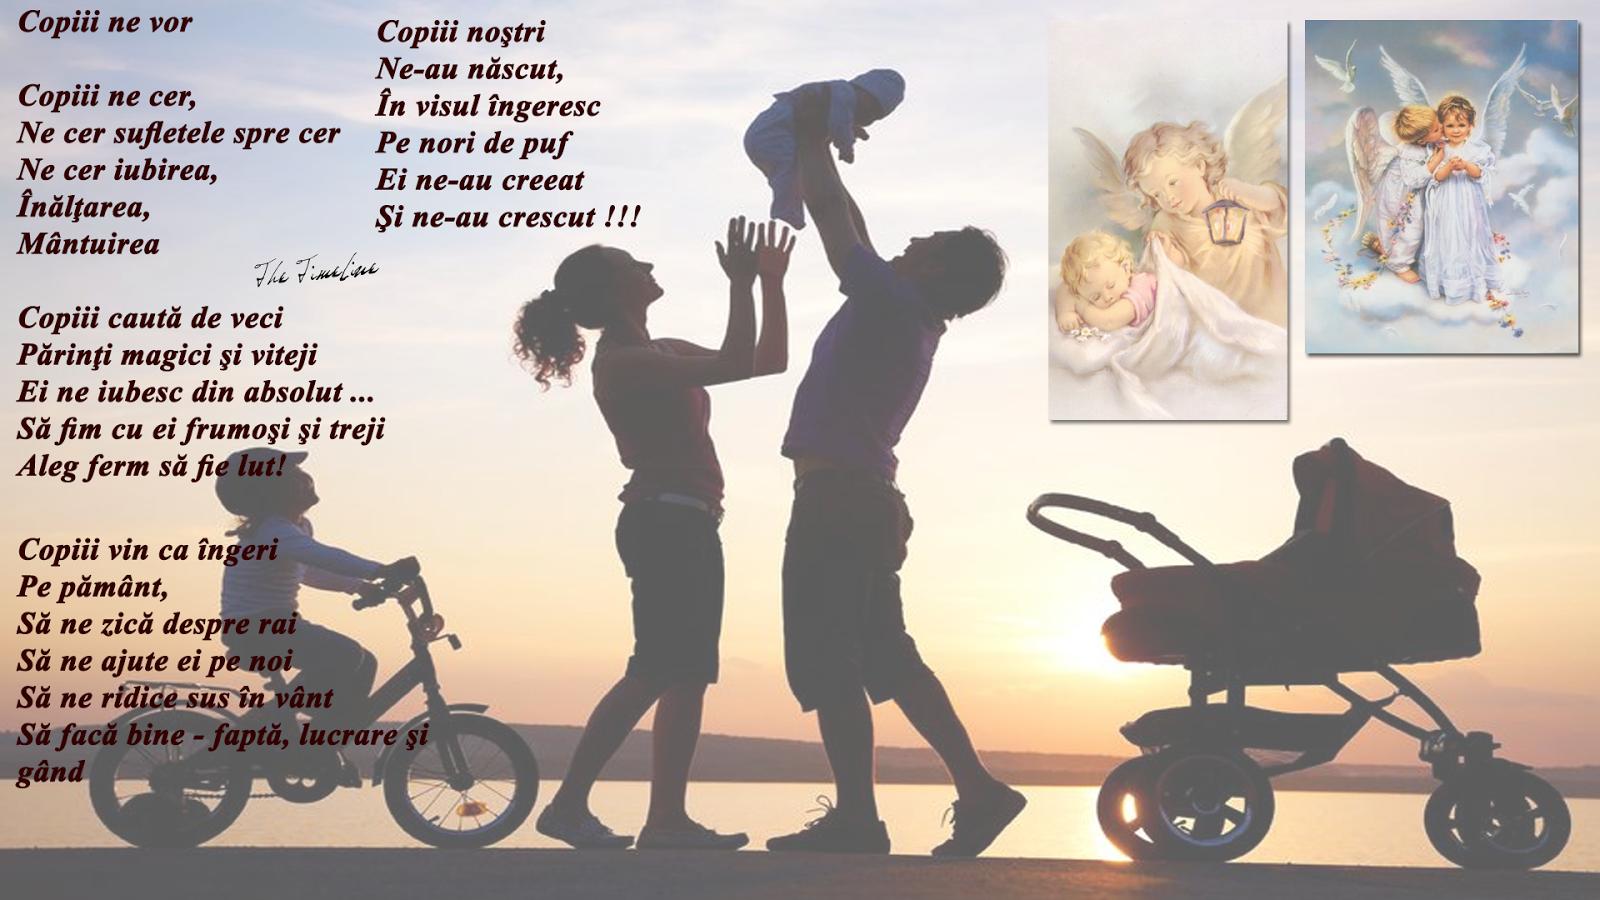 copiii ne vor parinti copii suflete predestinare Dumnezeu ingeri mantuire inaltare dragoste iubire viata Maria Teodorescu Bahnareanu Wrinkles on my Timeline